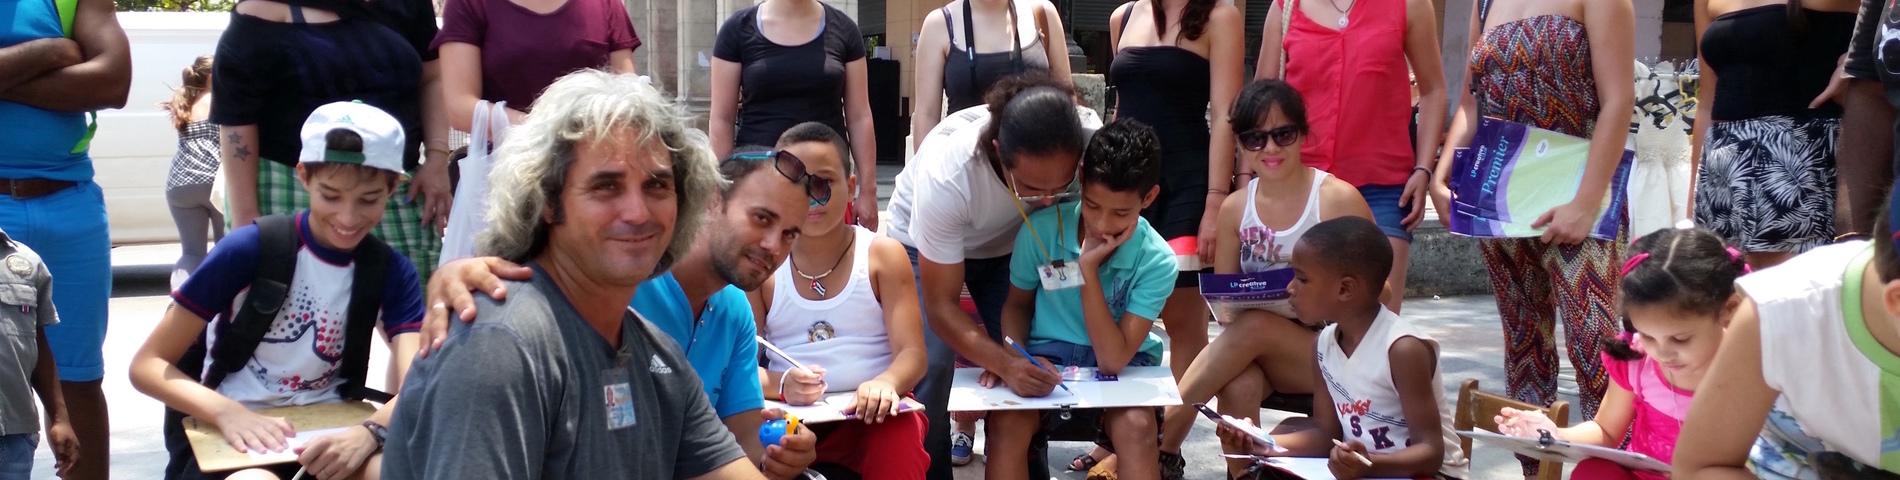 Corazón Cuba resim 1